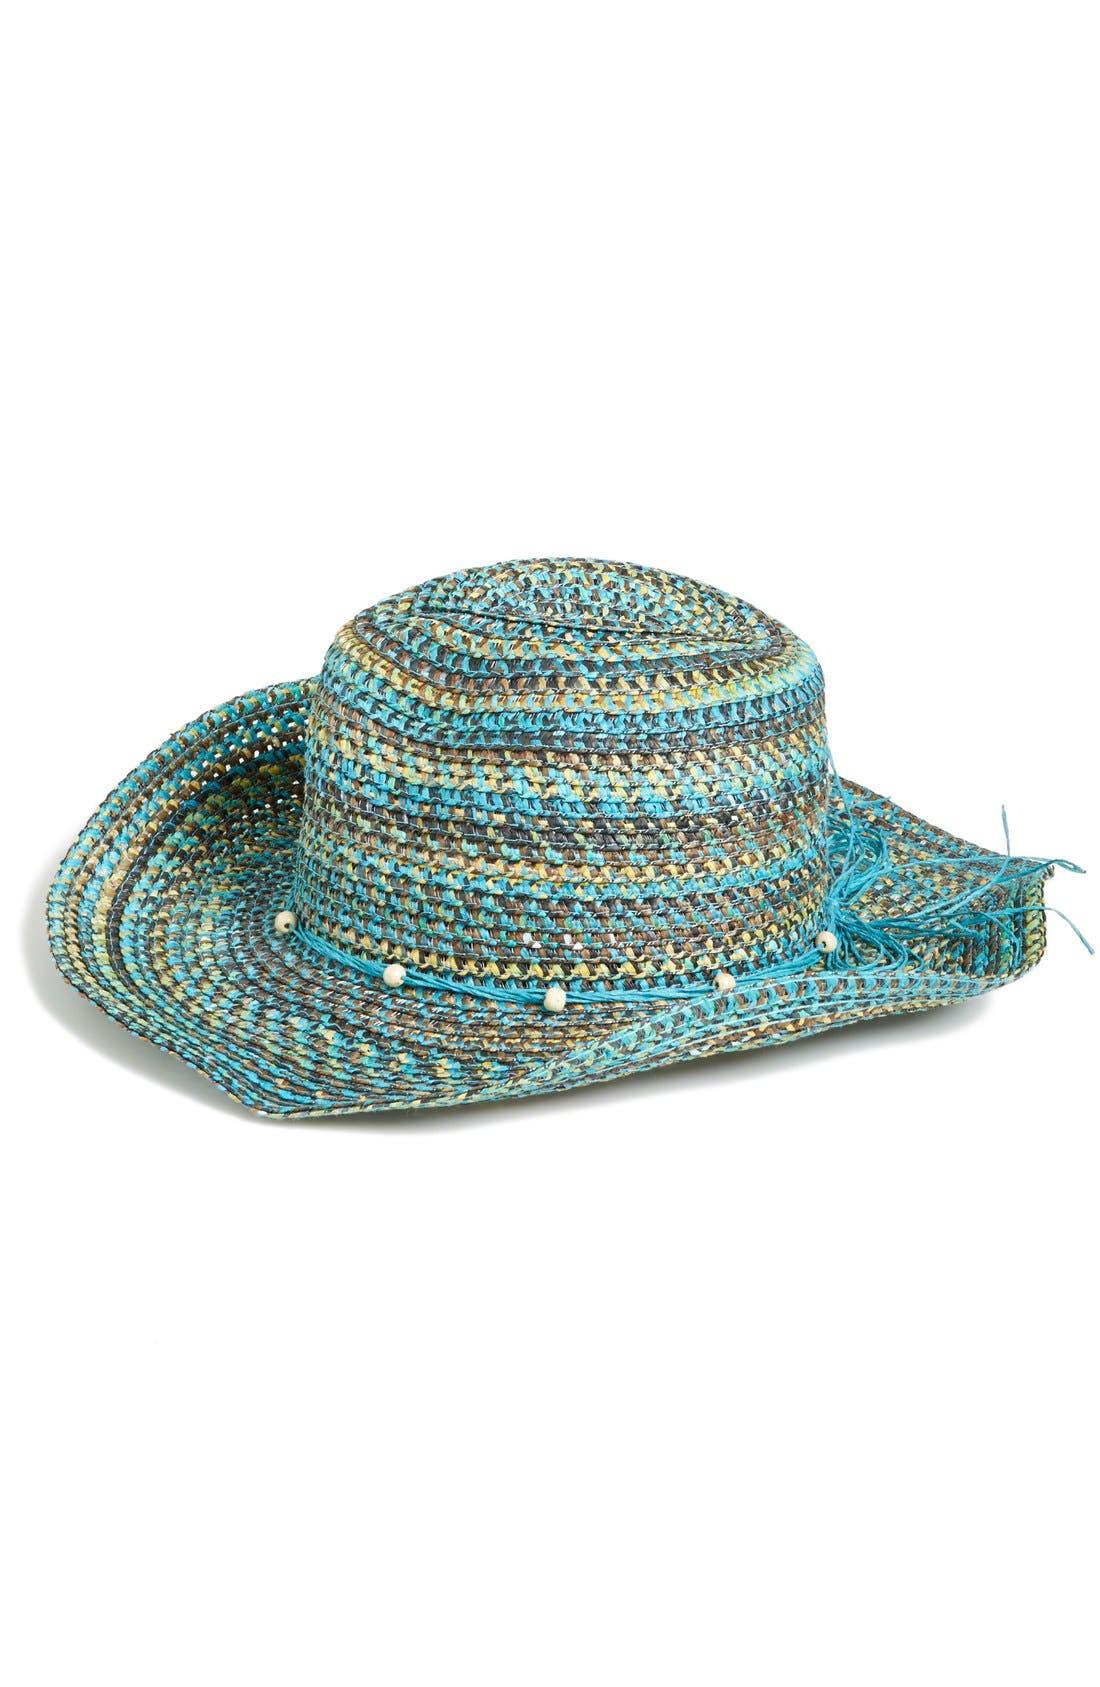 Main Image - T+C by Theodora & Callum Multicolor Straw Hat